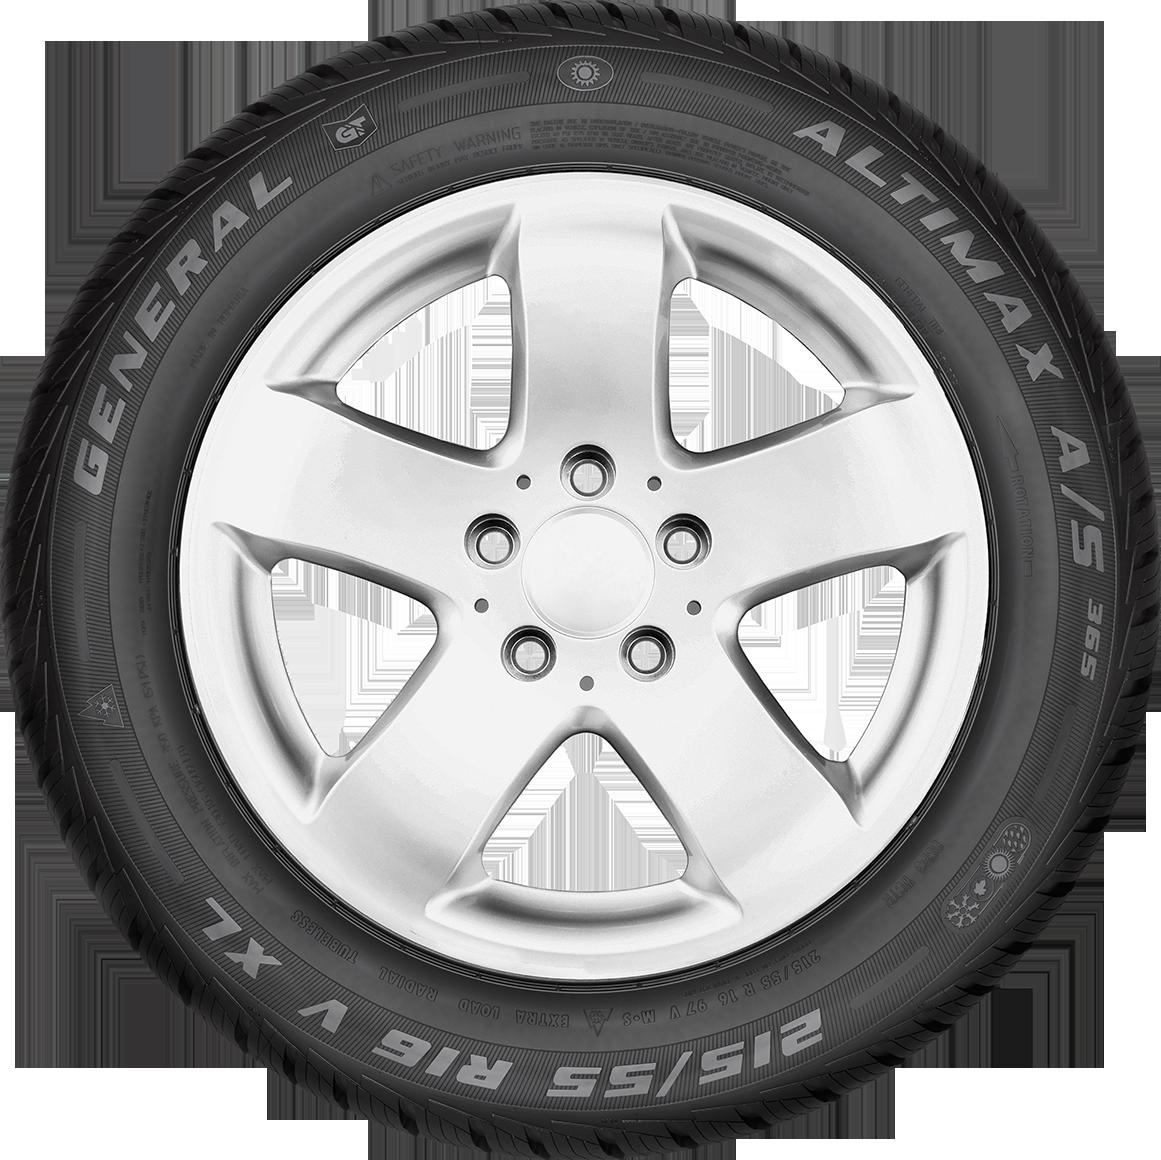 Altimax a s the. Wheel clipart rubber tire